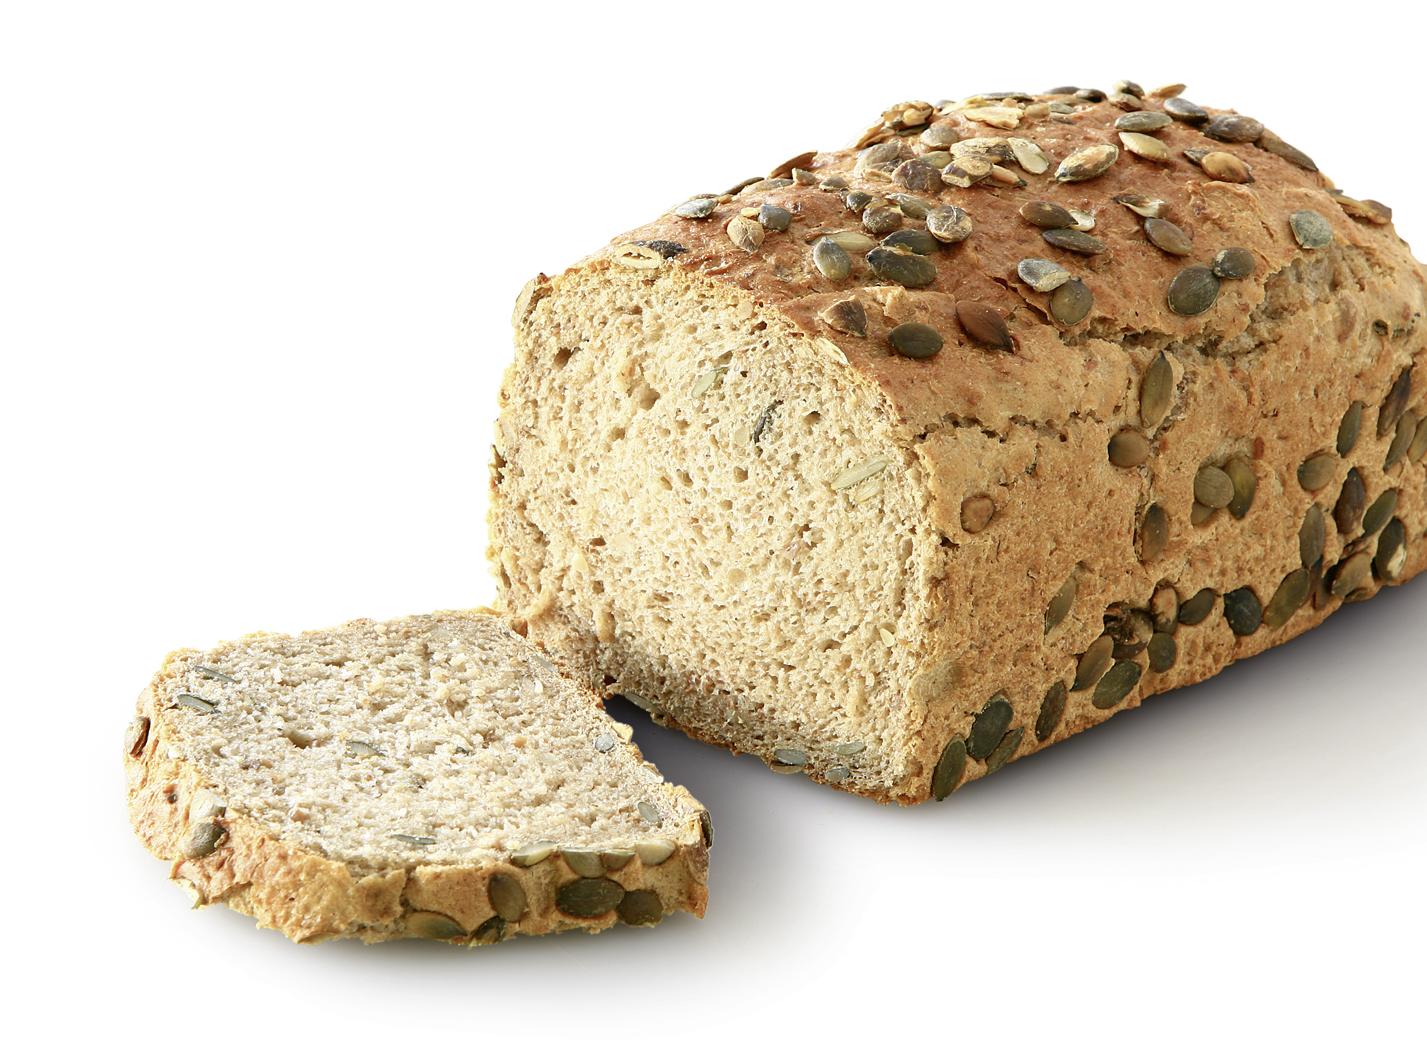 Pumpkin Seed Bread - Wheat bread with 29% wheat flour and 8.5% pumpkin seeds length: 21 cm